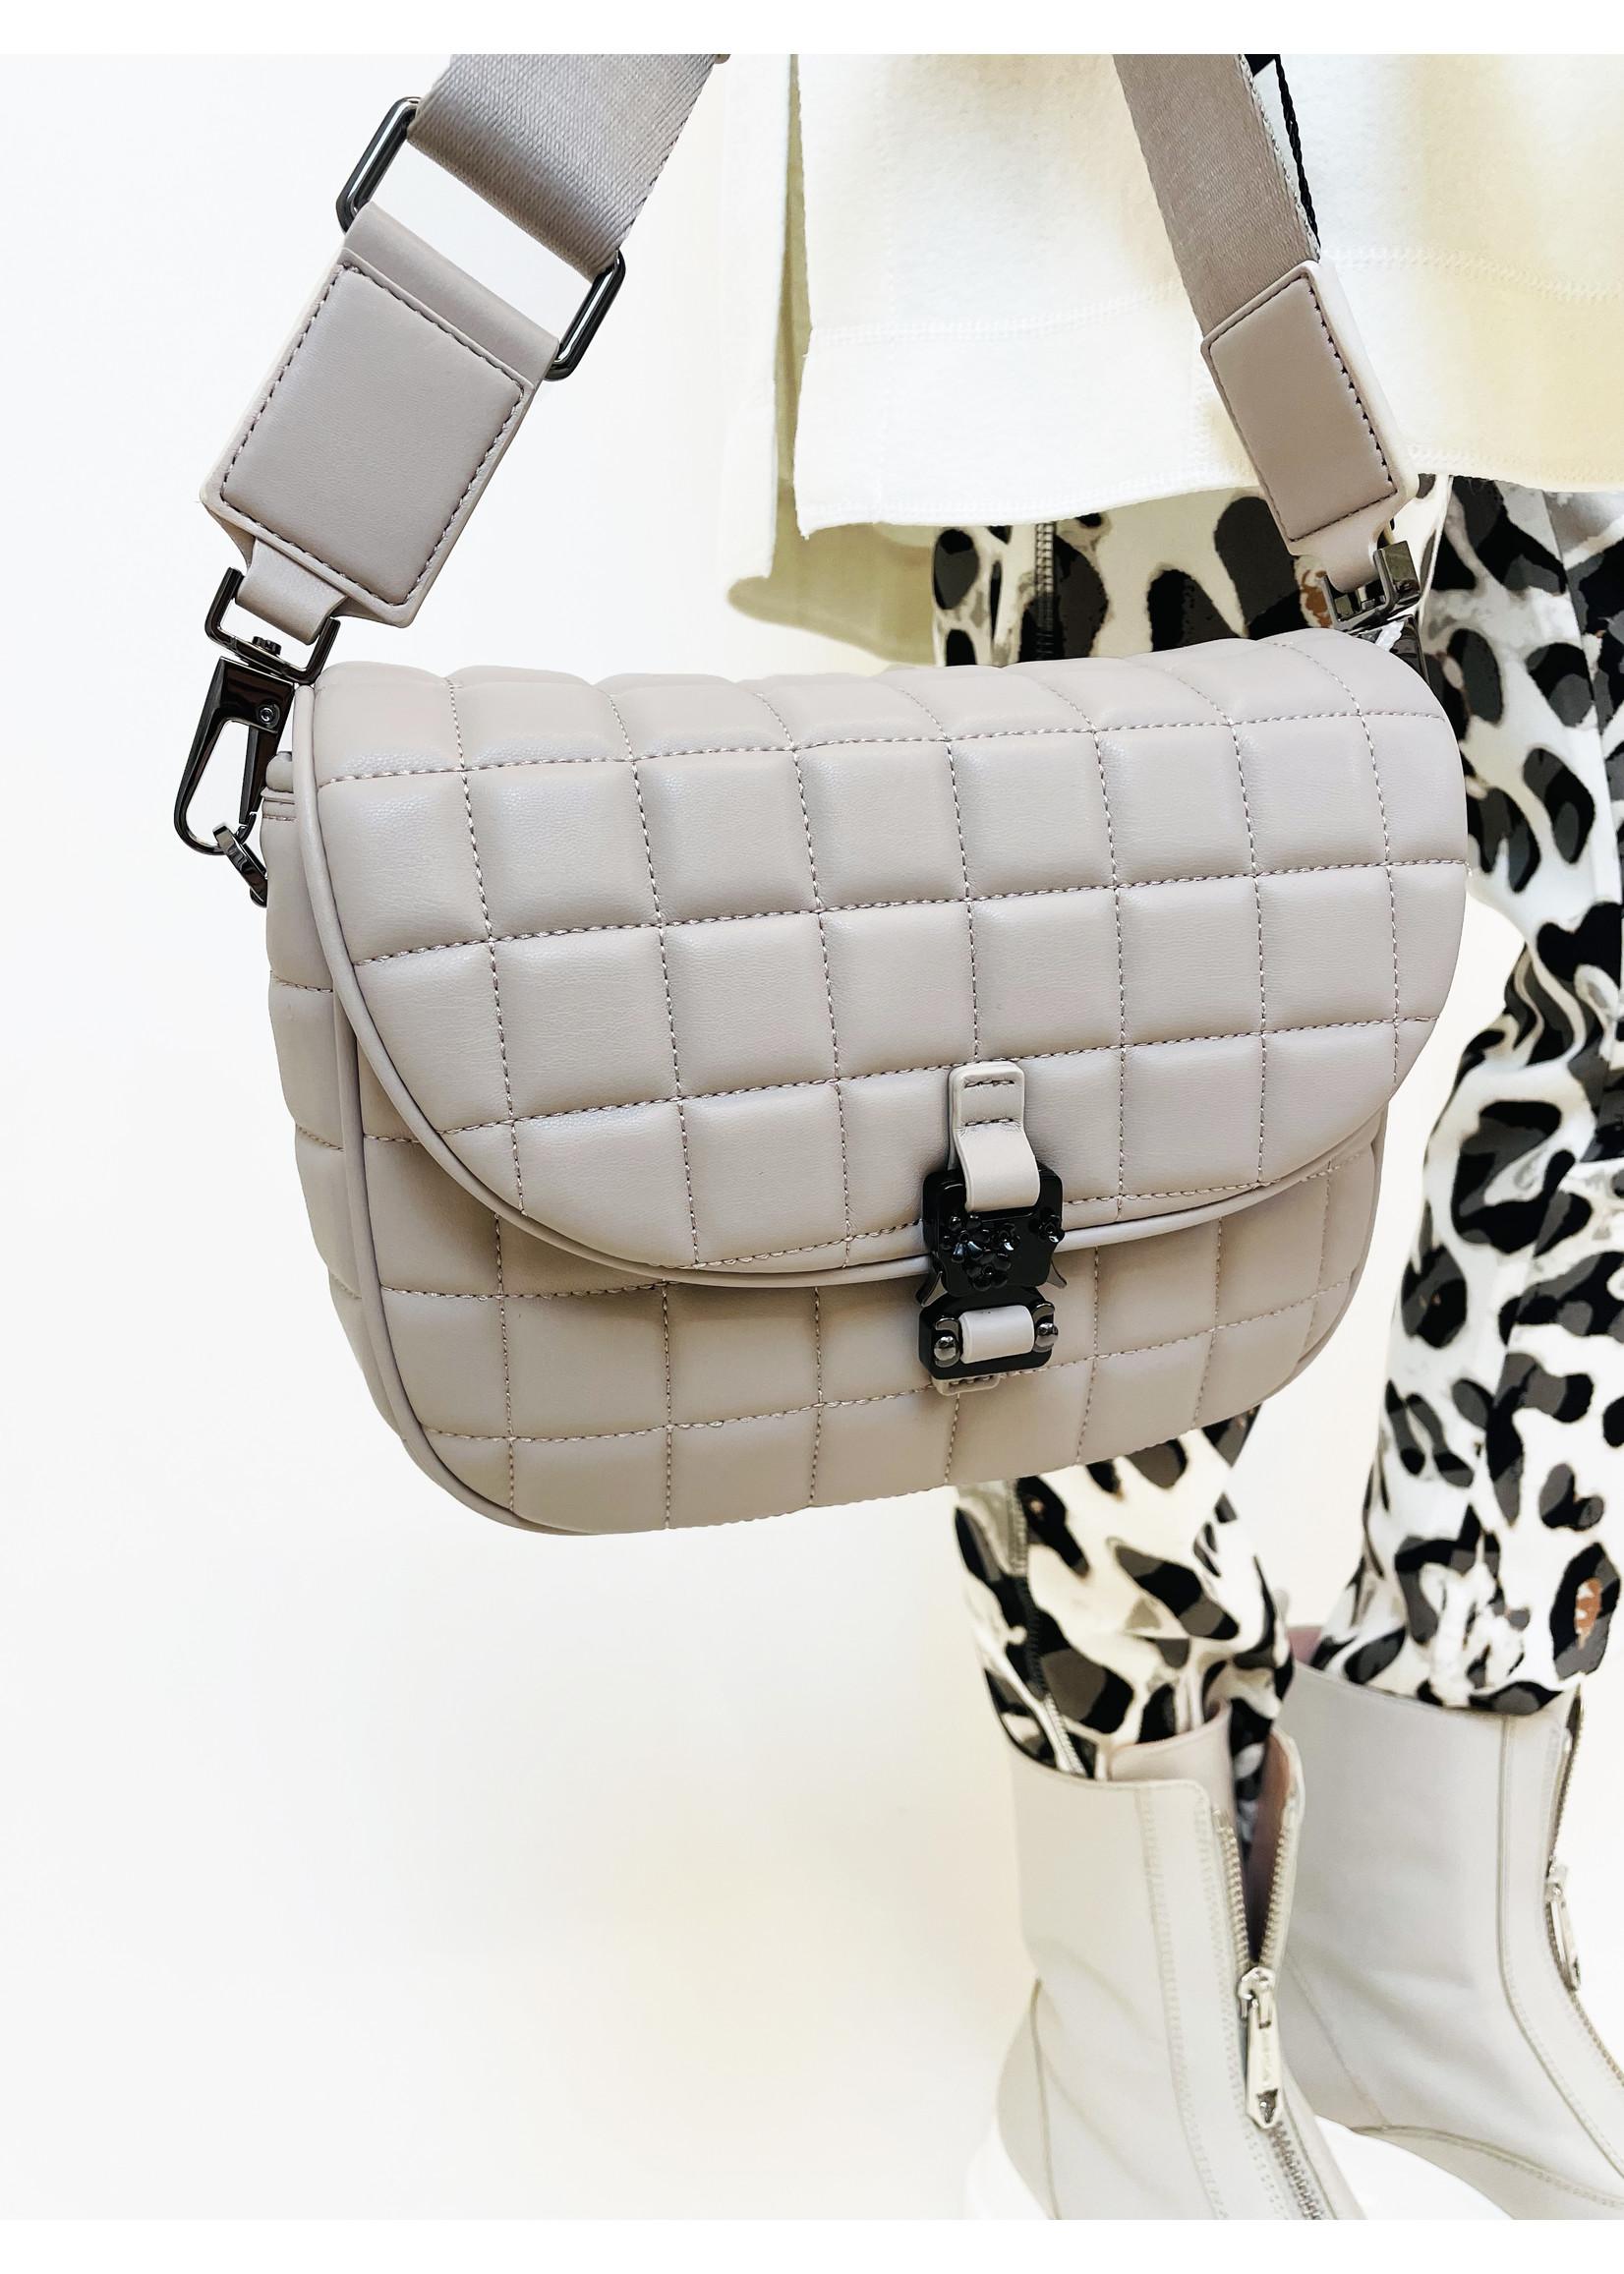 Marccain Bags & Shoes Shopper RB TI.14 Z05 Kleding